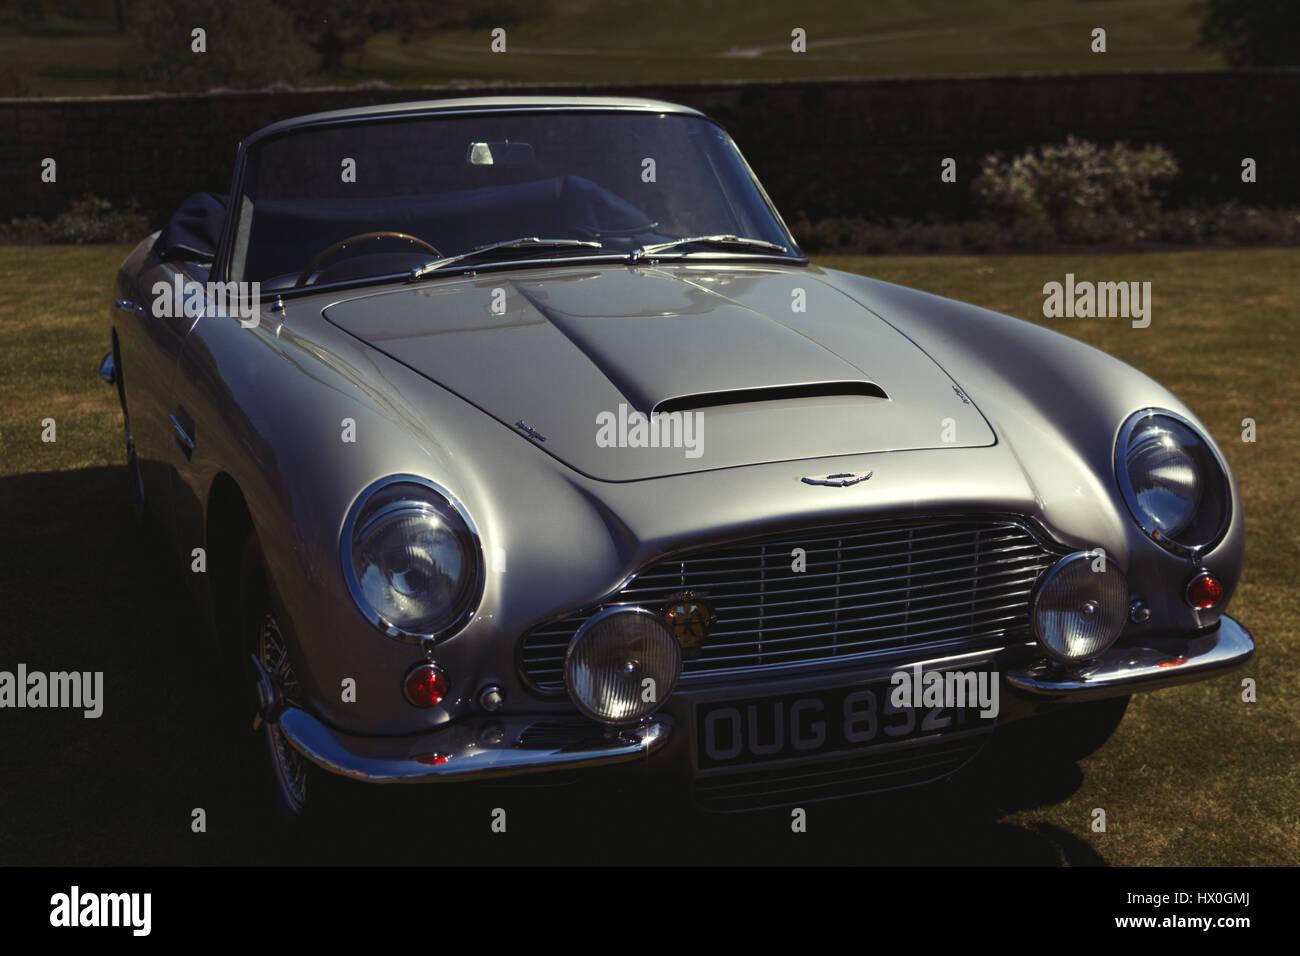 Old Fashioned Aston Martin Car Stock Photo 136466754 Alamy